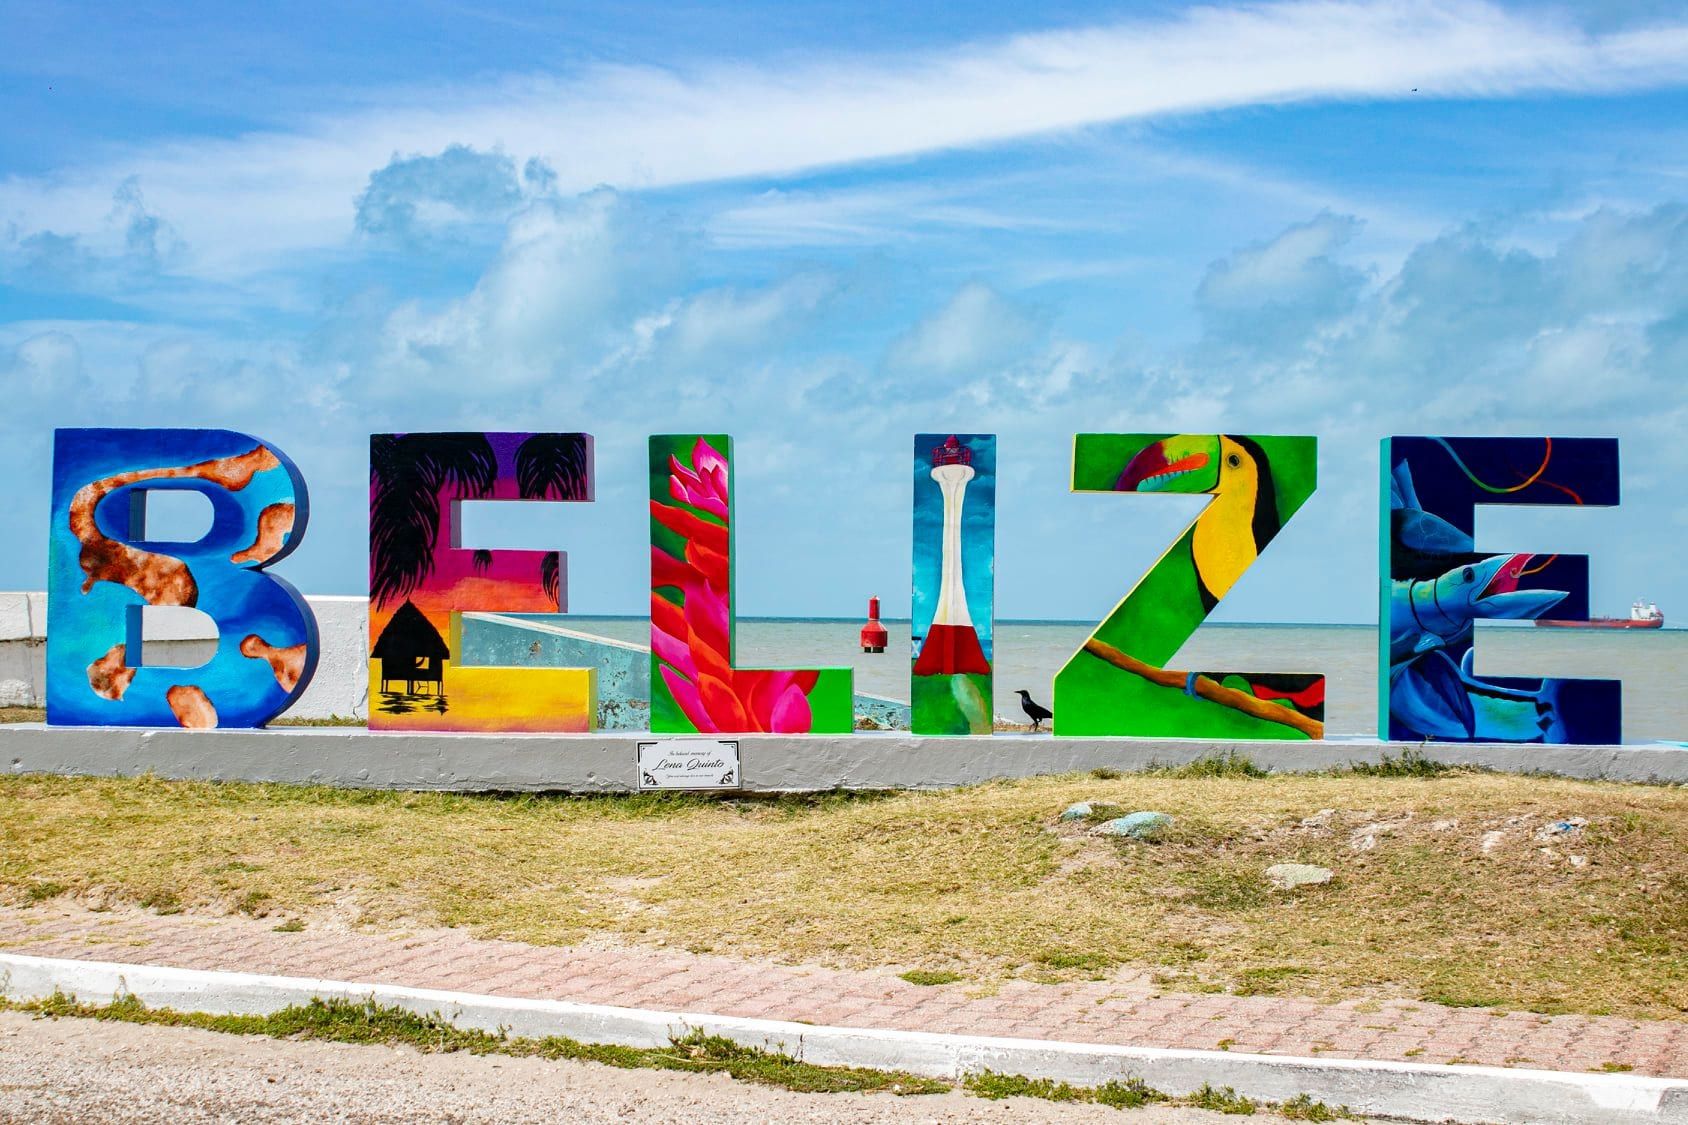 new-belize-city-sign-painted-photo-by-belize-city-council